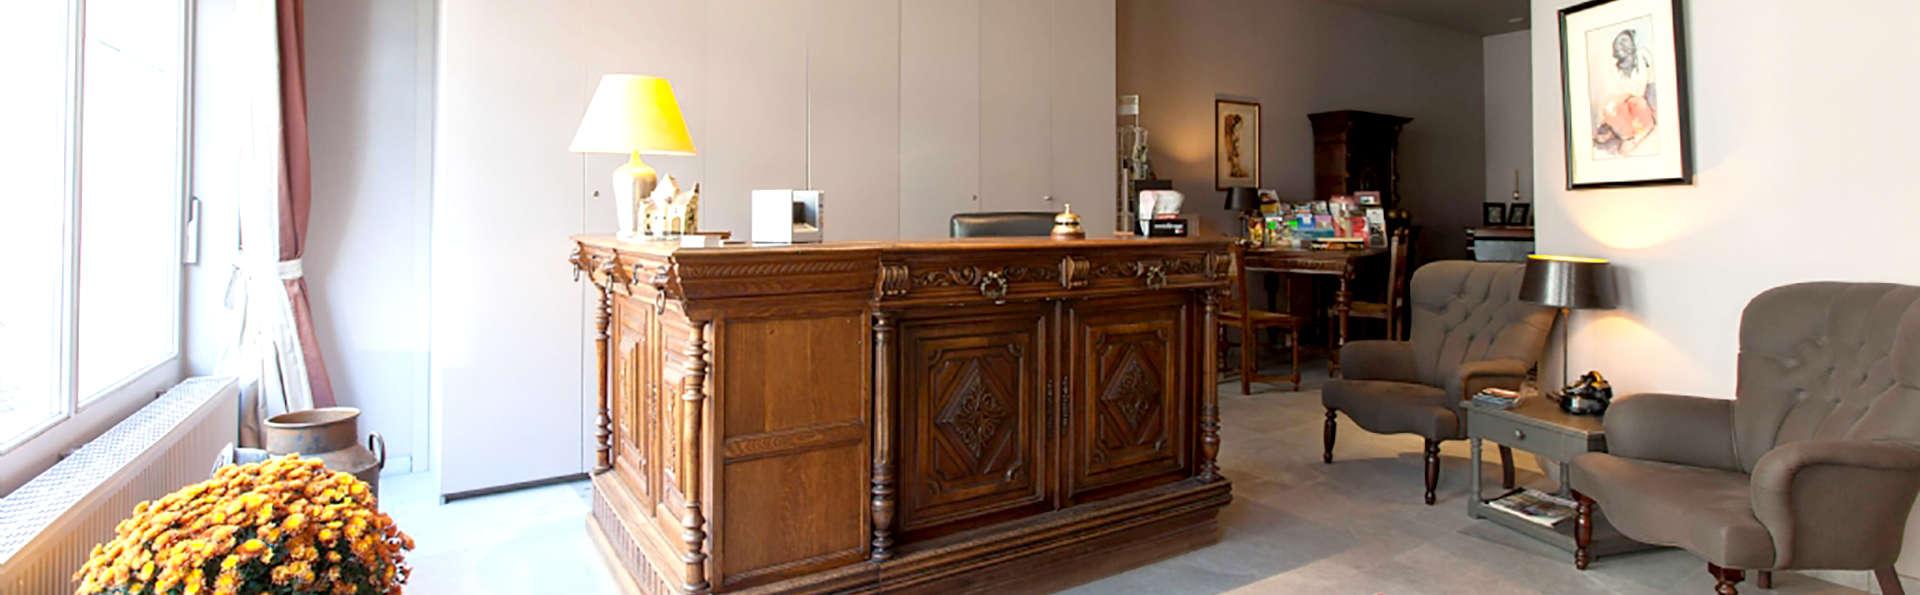 Hotel Boterhuis - Edit_Reception.jpg